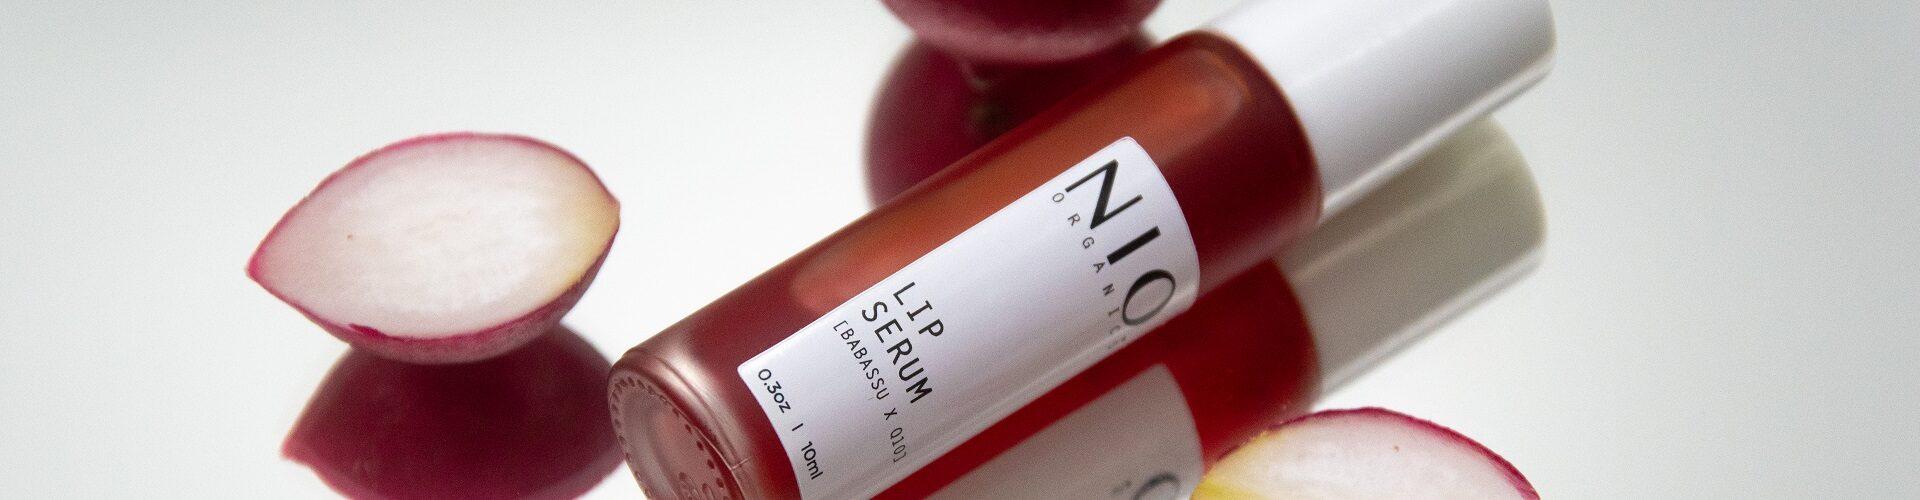 Nio organics - Lip Serum [Babassu X Q10]